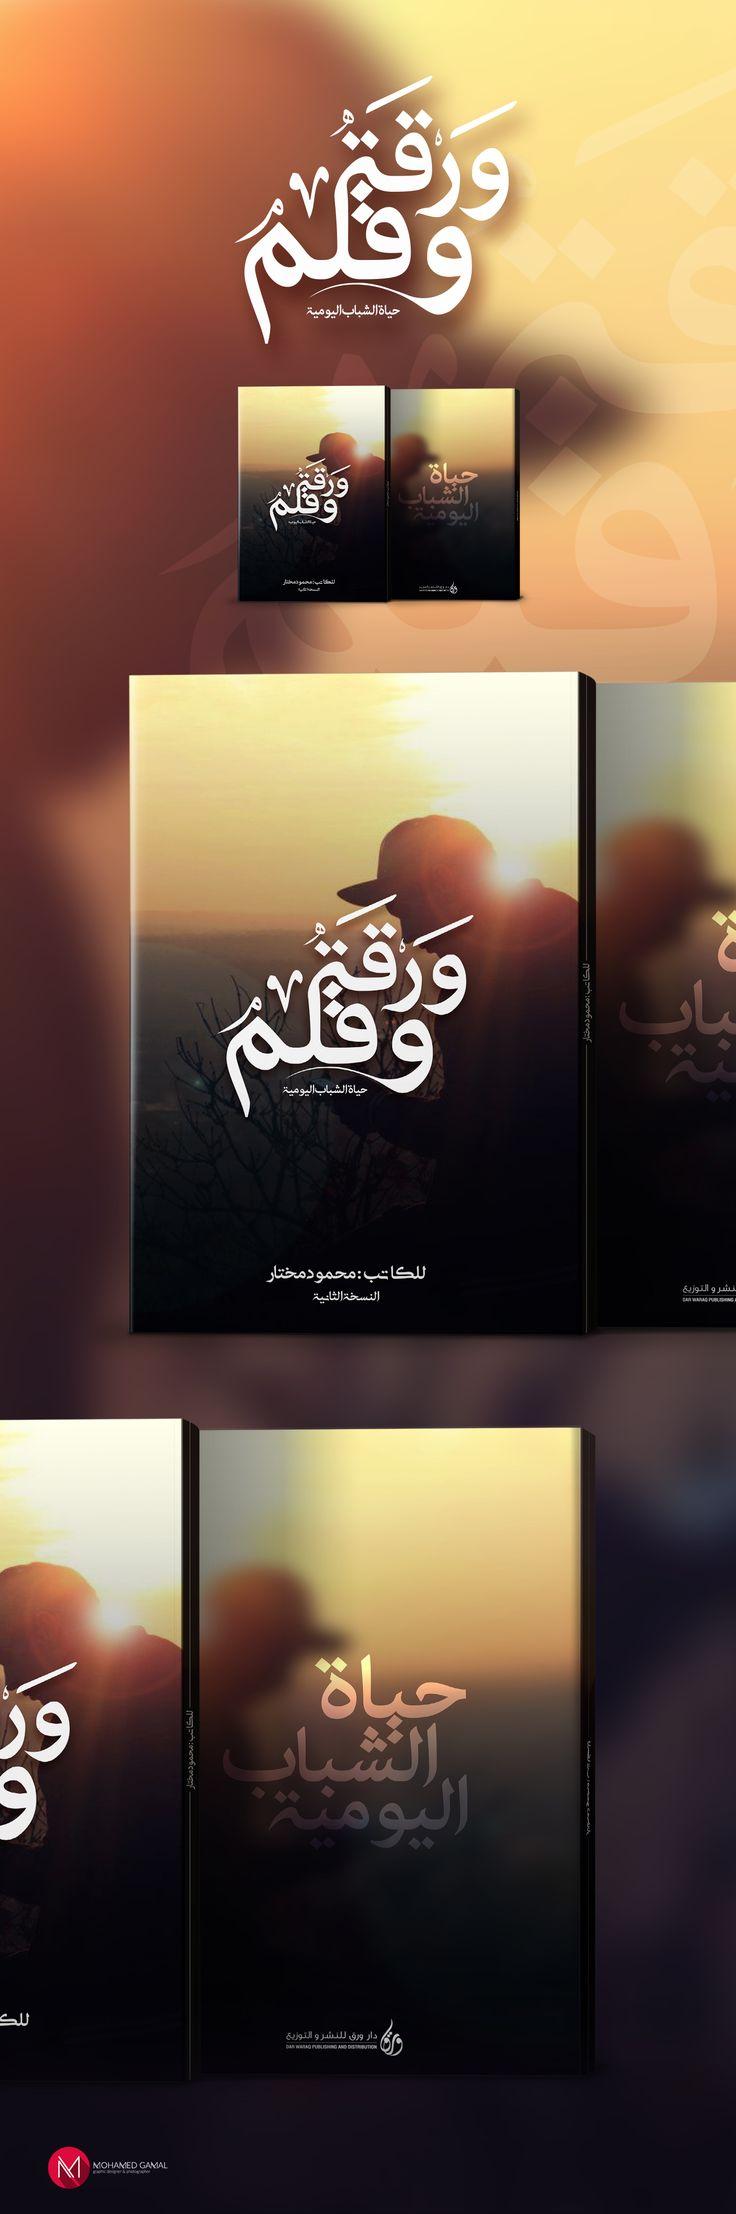 "Check out my @Behance project: ""NEW ARABIC BOOK DESIGN"" https://www.behance.net/gallery/52815803/NEW-ARABIC-BOOK-DESIGN"